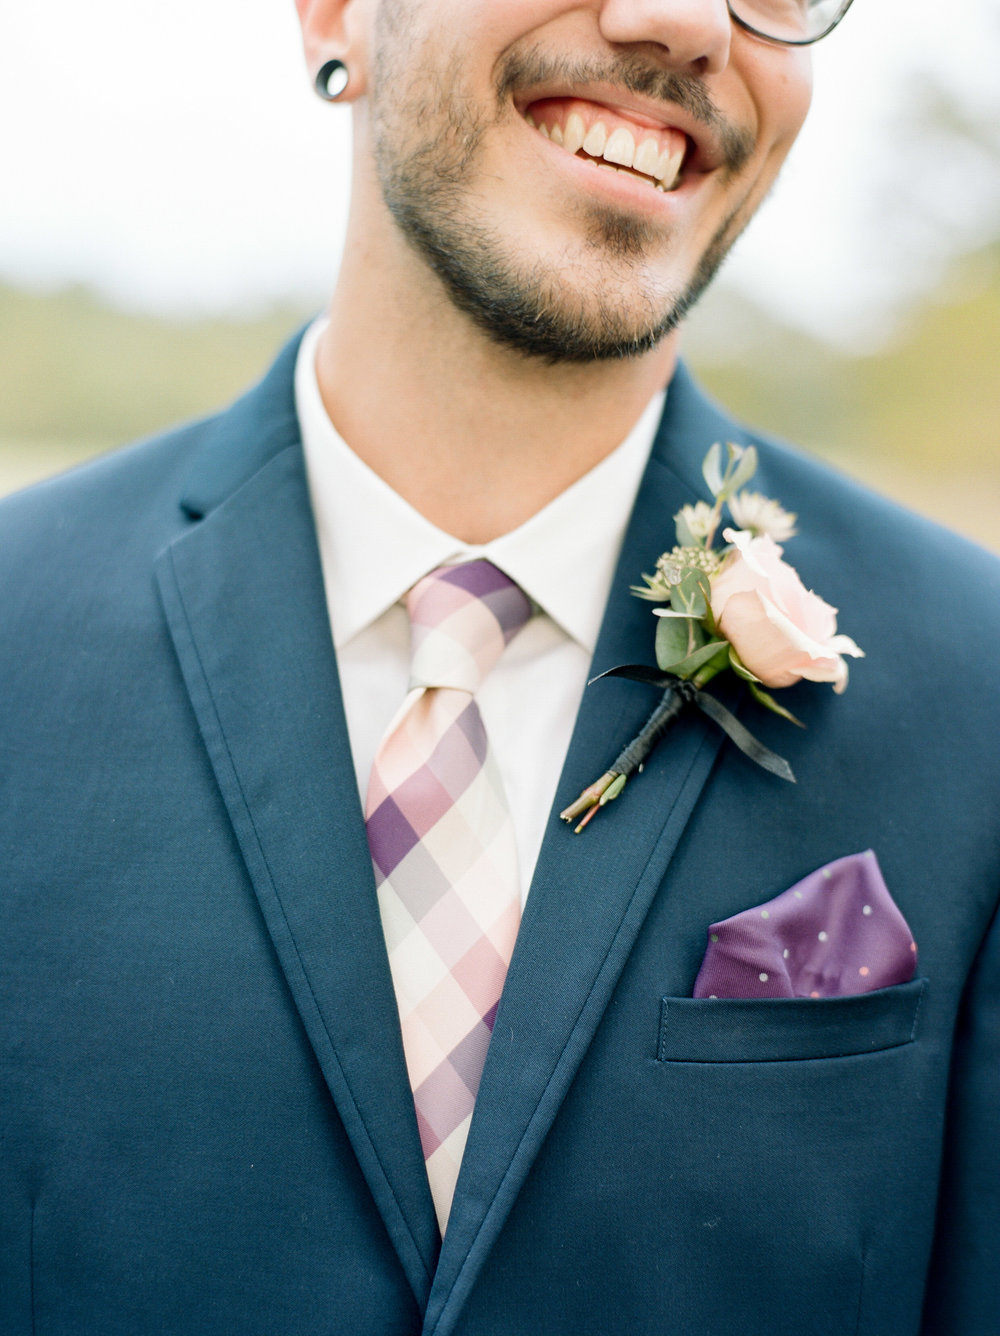 Houston-Wedding-Photographer-Fine-Art-Film-Destination-Style-Me-Pretty-Austin-Dallas-New-Orleans-Dana-Fernandez-Photography-The Woodlands-Country-Club-9.jpg